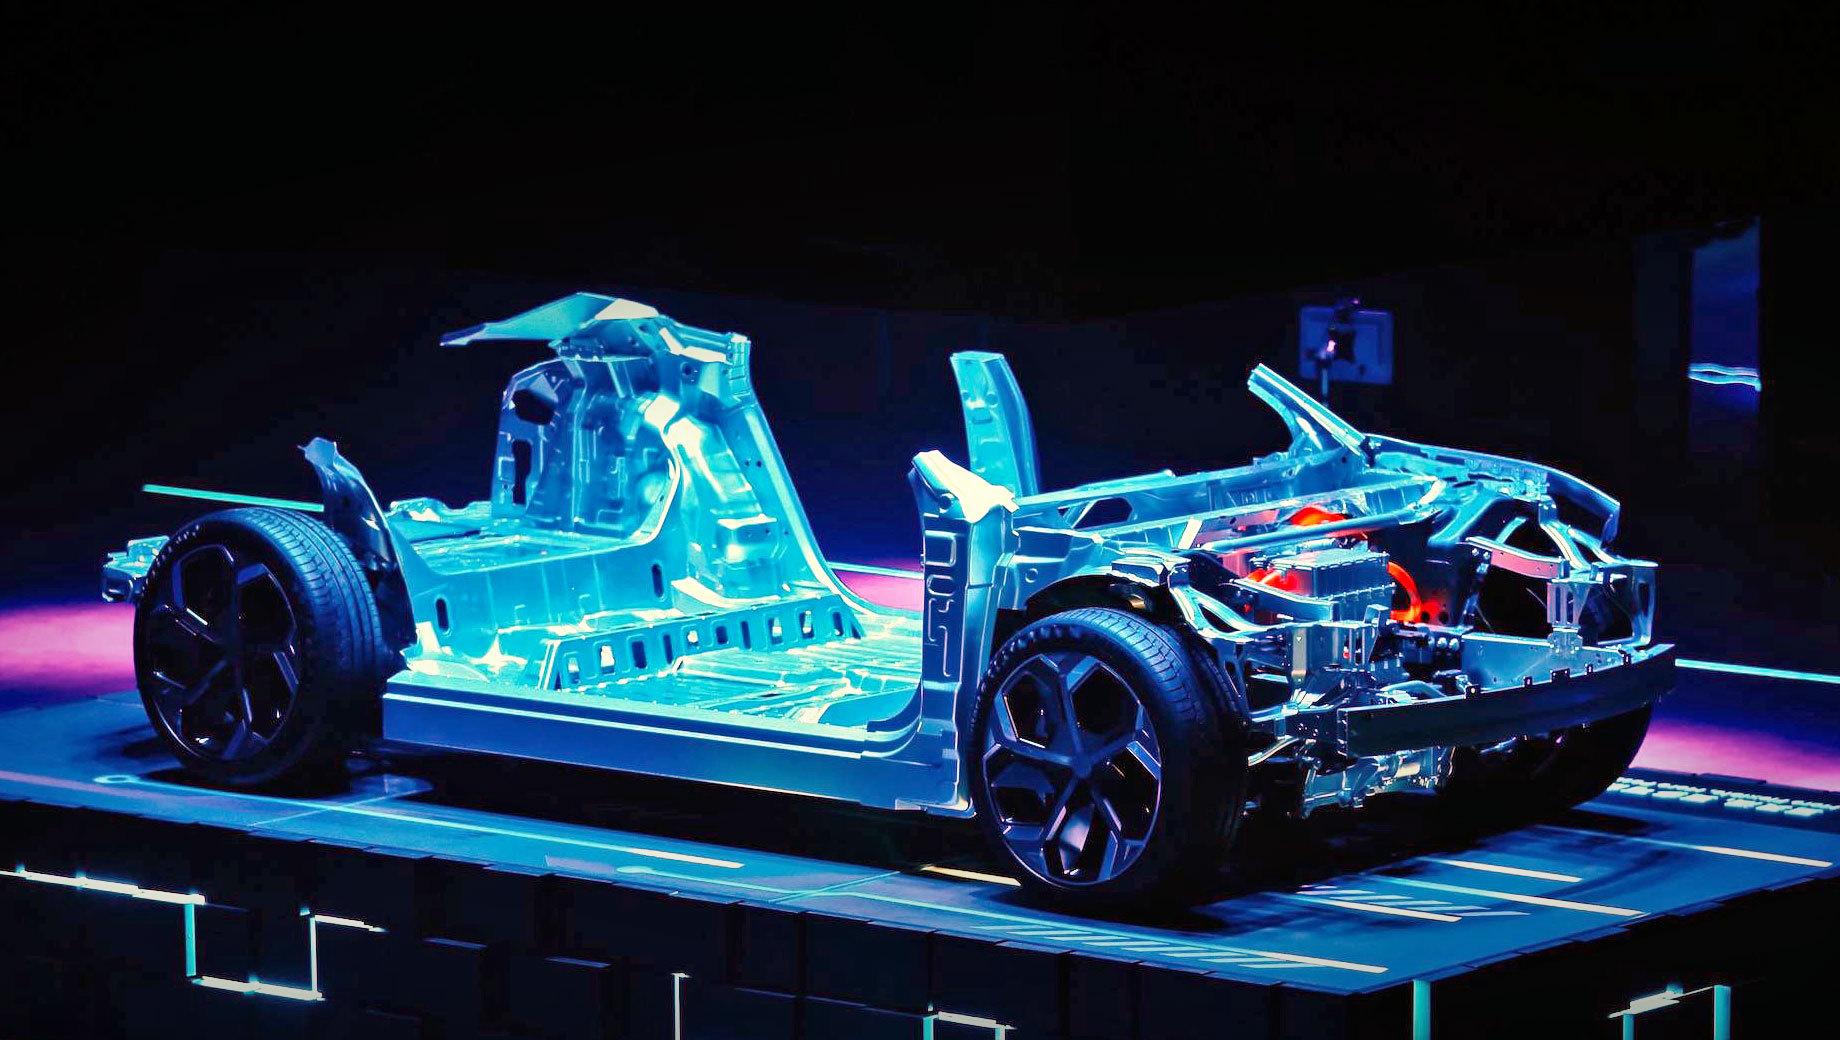 Volvo xc20. Платформа SEA (Sustainable Experience Architecture), представленная на днях концептом от Lynk & Co, рассчитана на электрокары с колёсной базой в 1800–3300 мм. У XC40 между осями 2702 мм, а у XC20 будет примерно 2500.